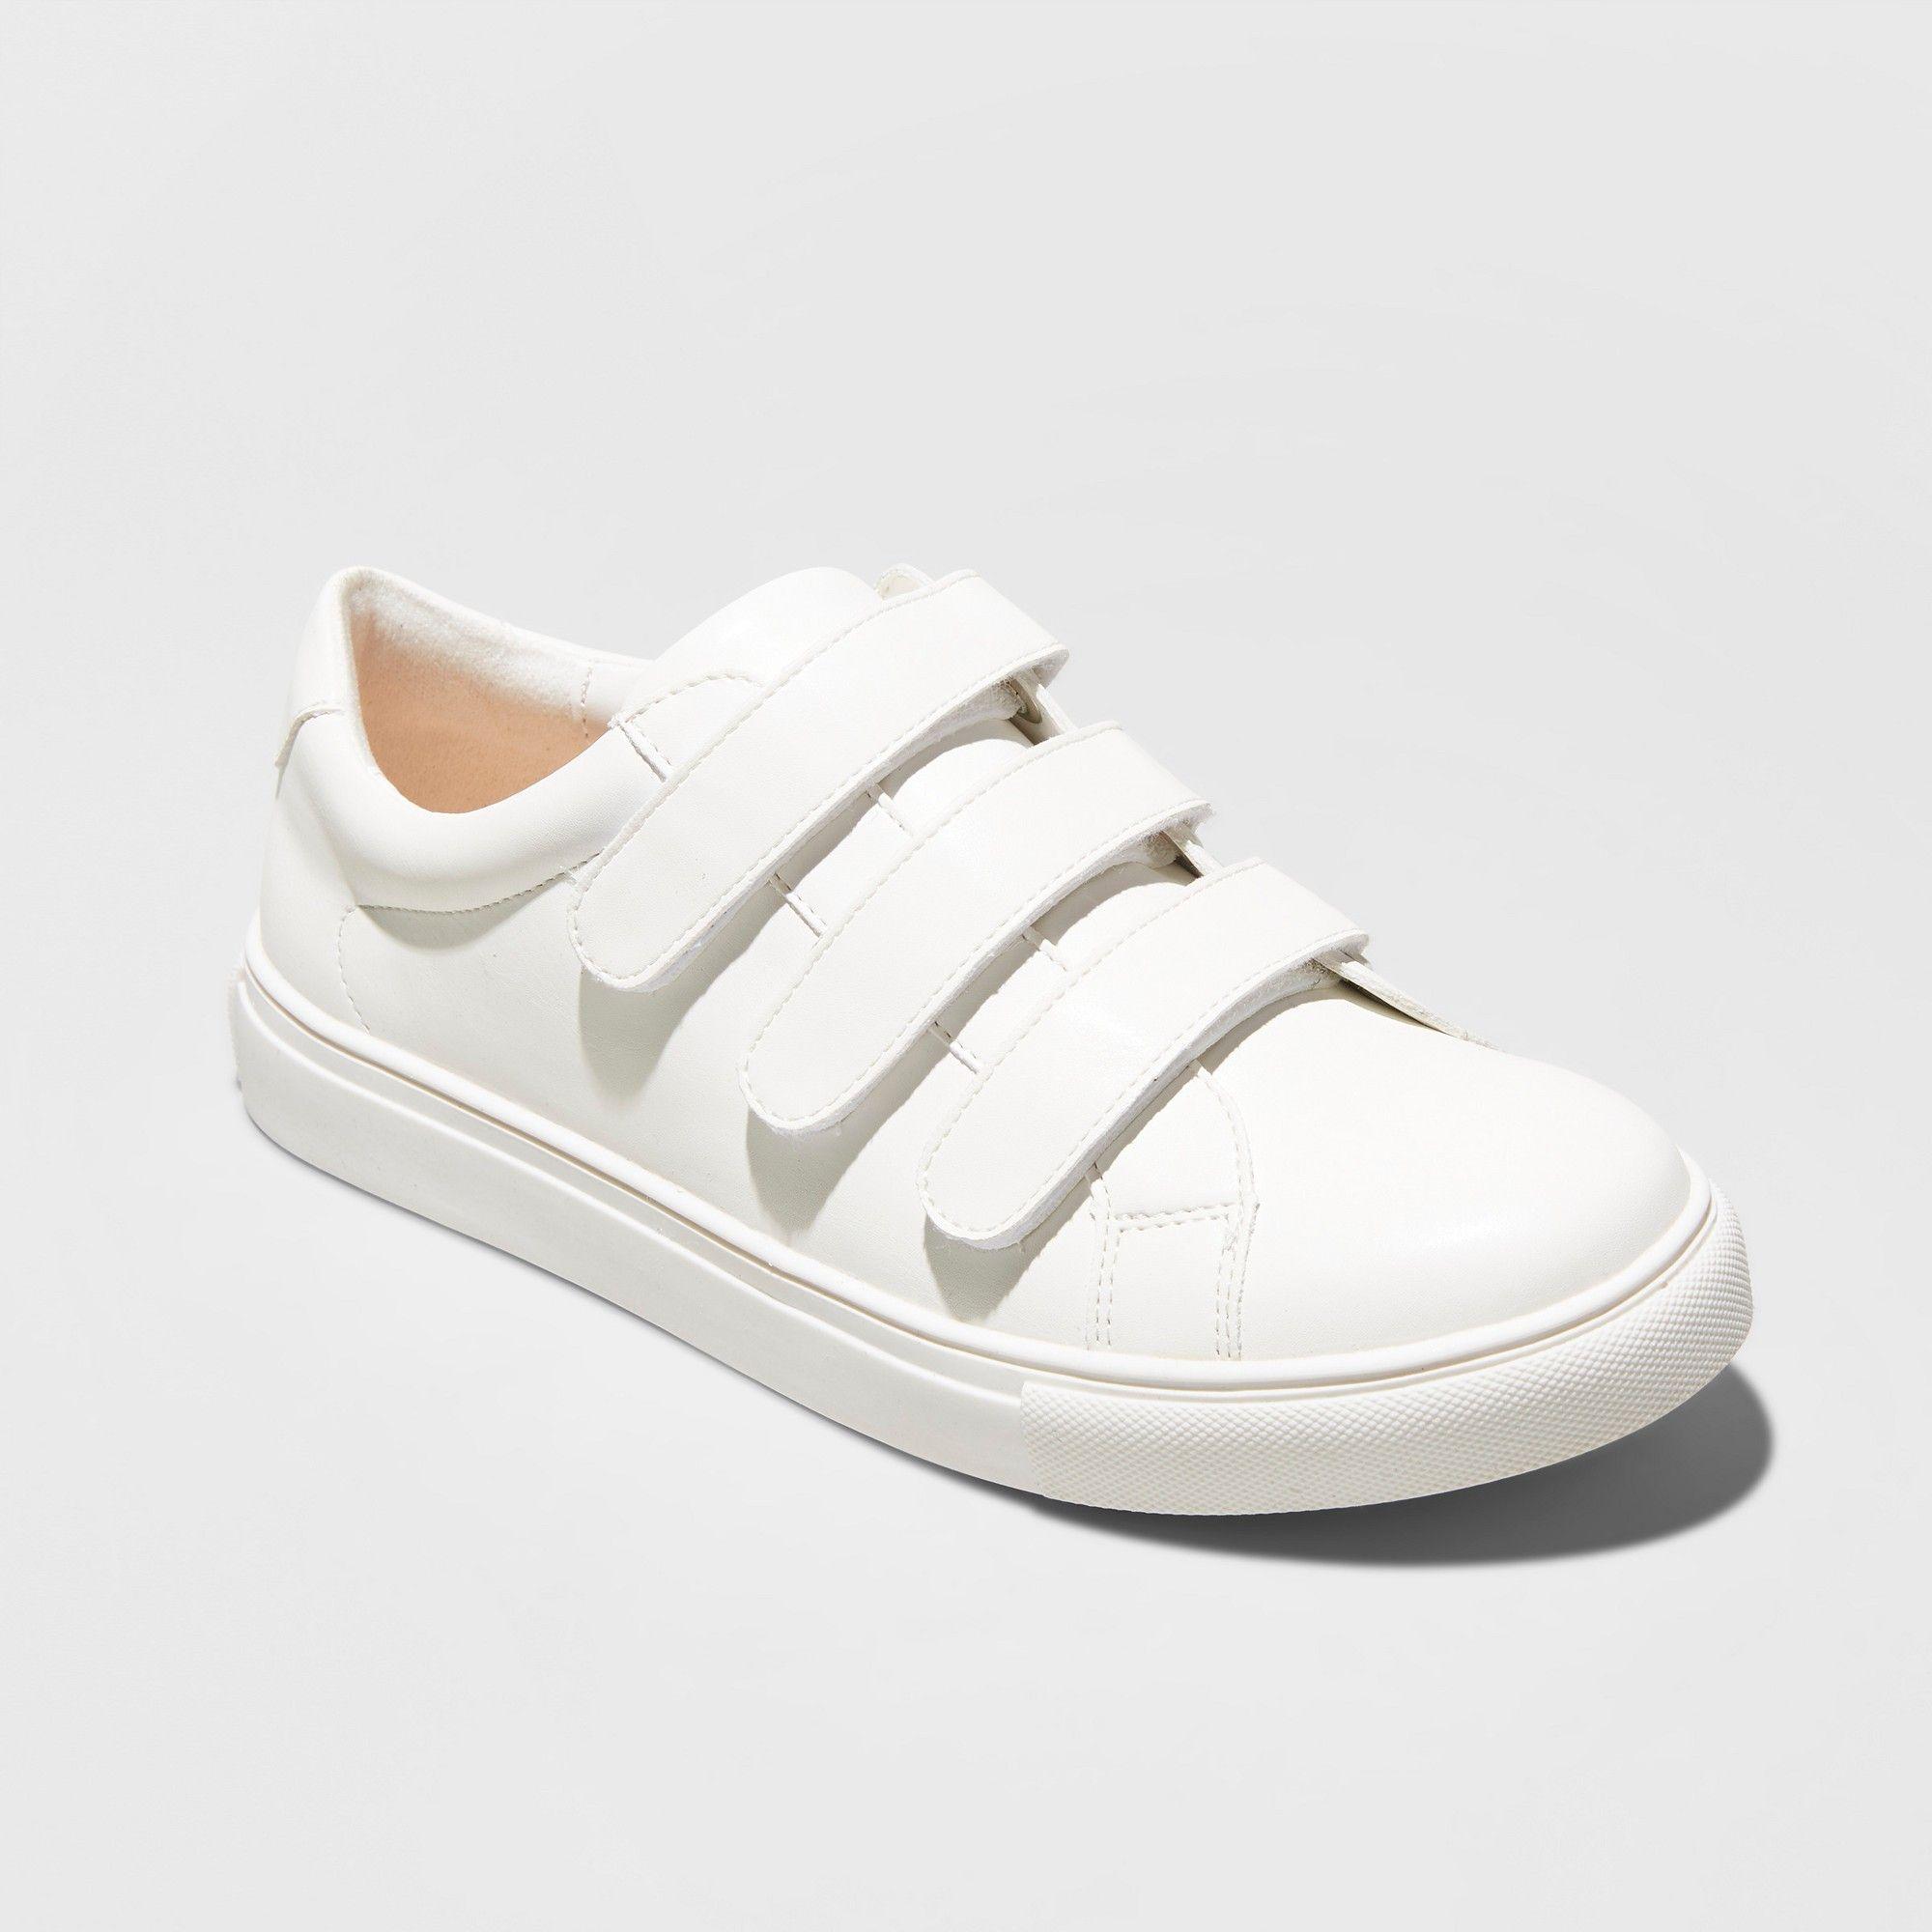 a1b298f20a29 Women s Whitney Wide Width Triple Strap Sneakers - A New Day White 9.5W